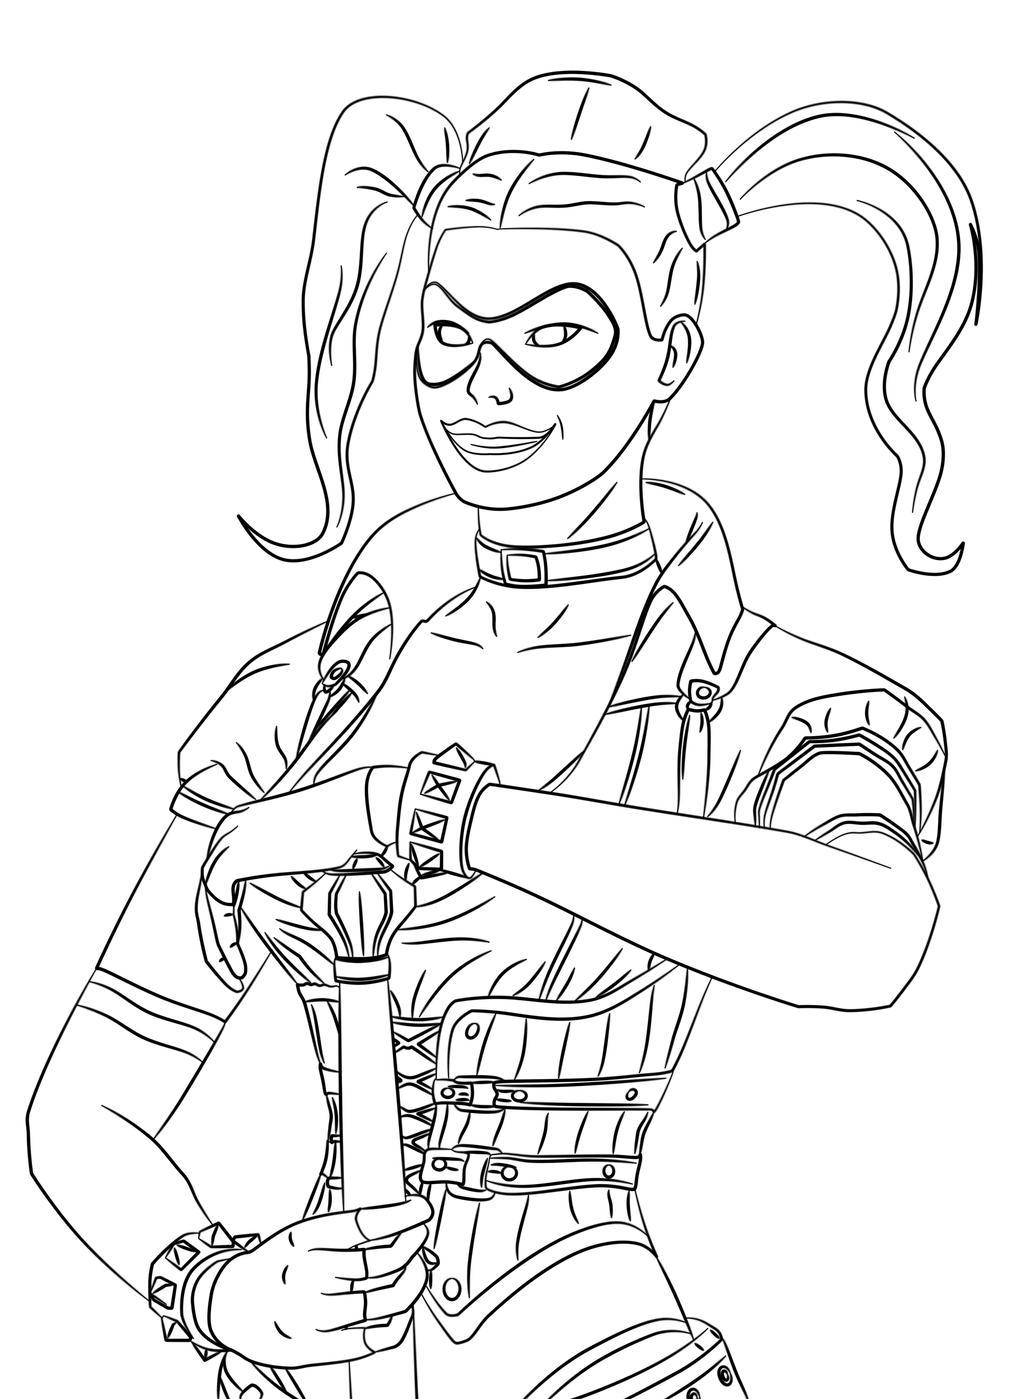 Printable coloring pages harley quinn - Harley Quinn By Viernadrottingu Harley Quinn By Viernadrottingu Harley Quinn By Viernadrottingu On Deviantart